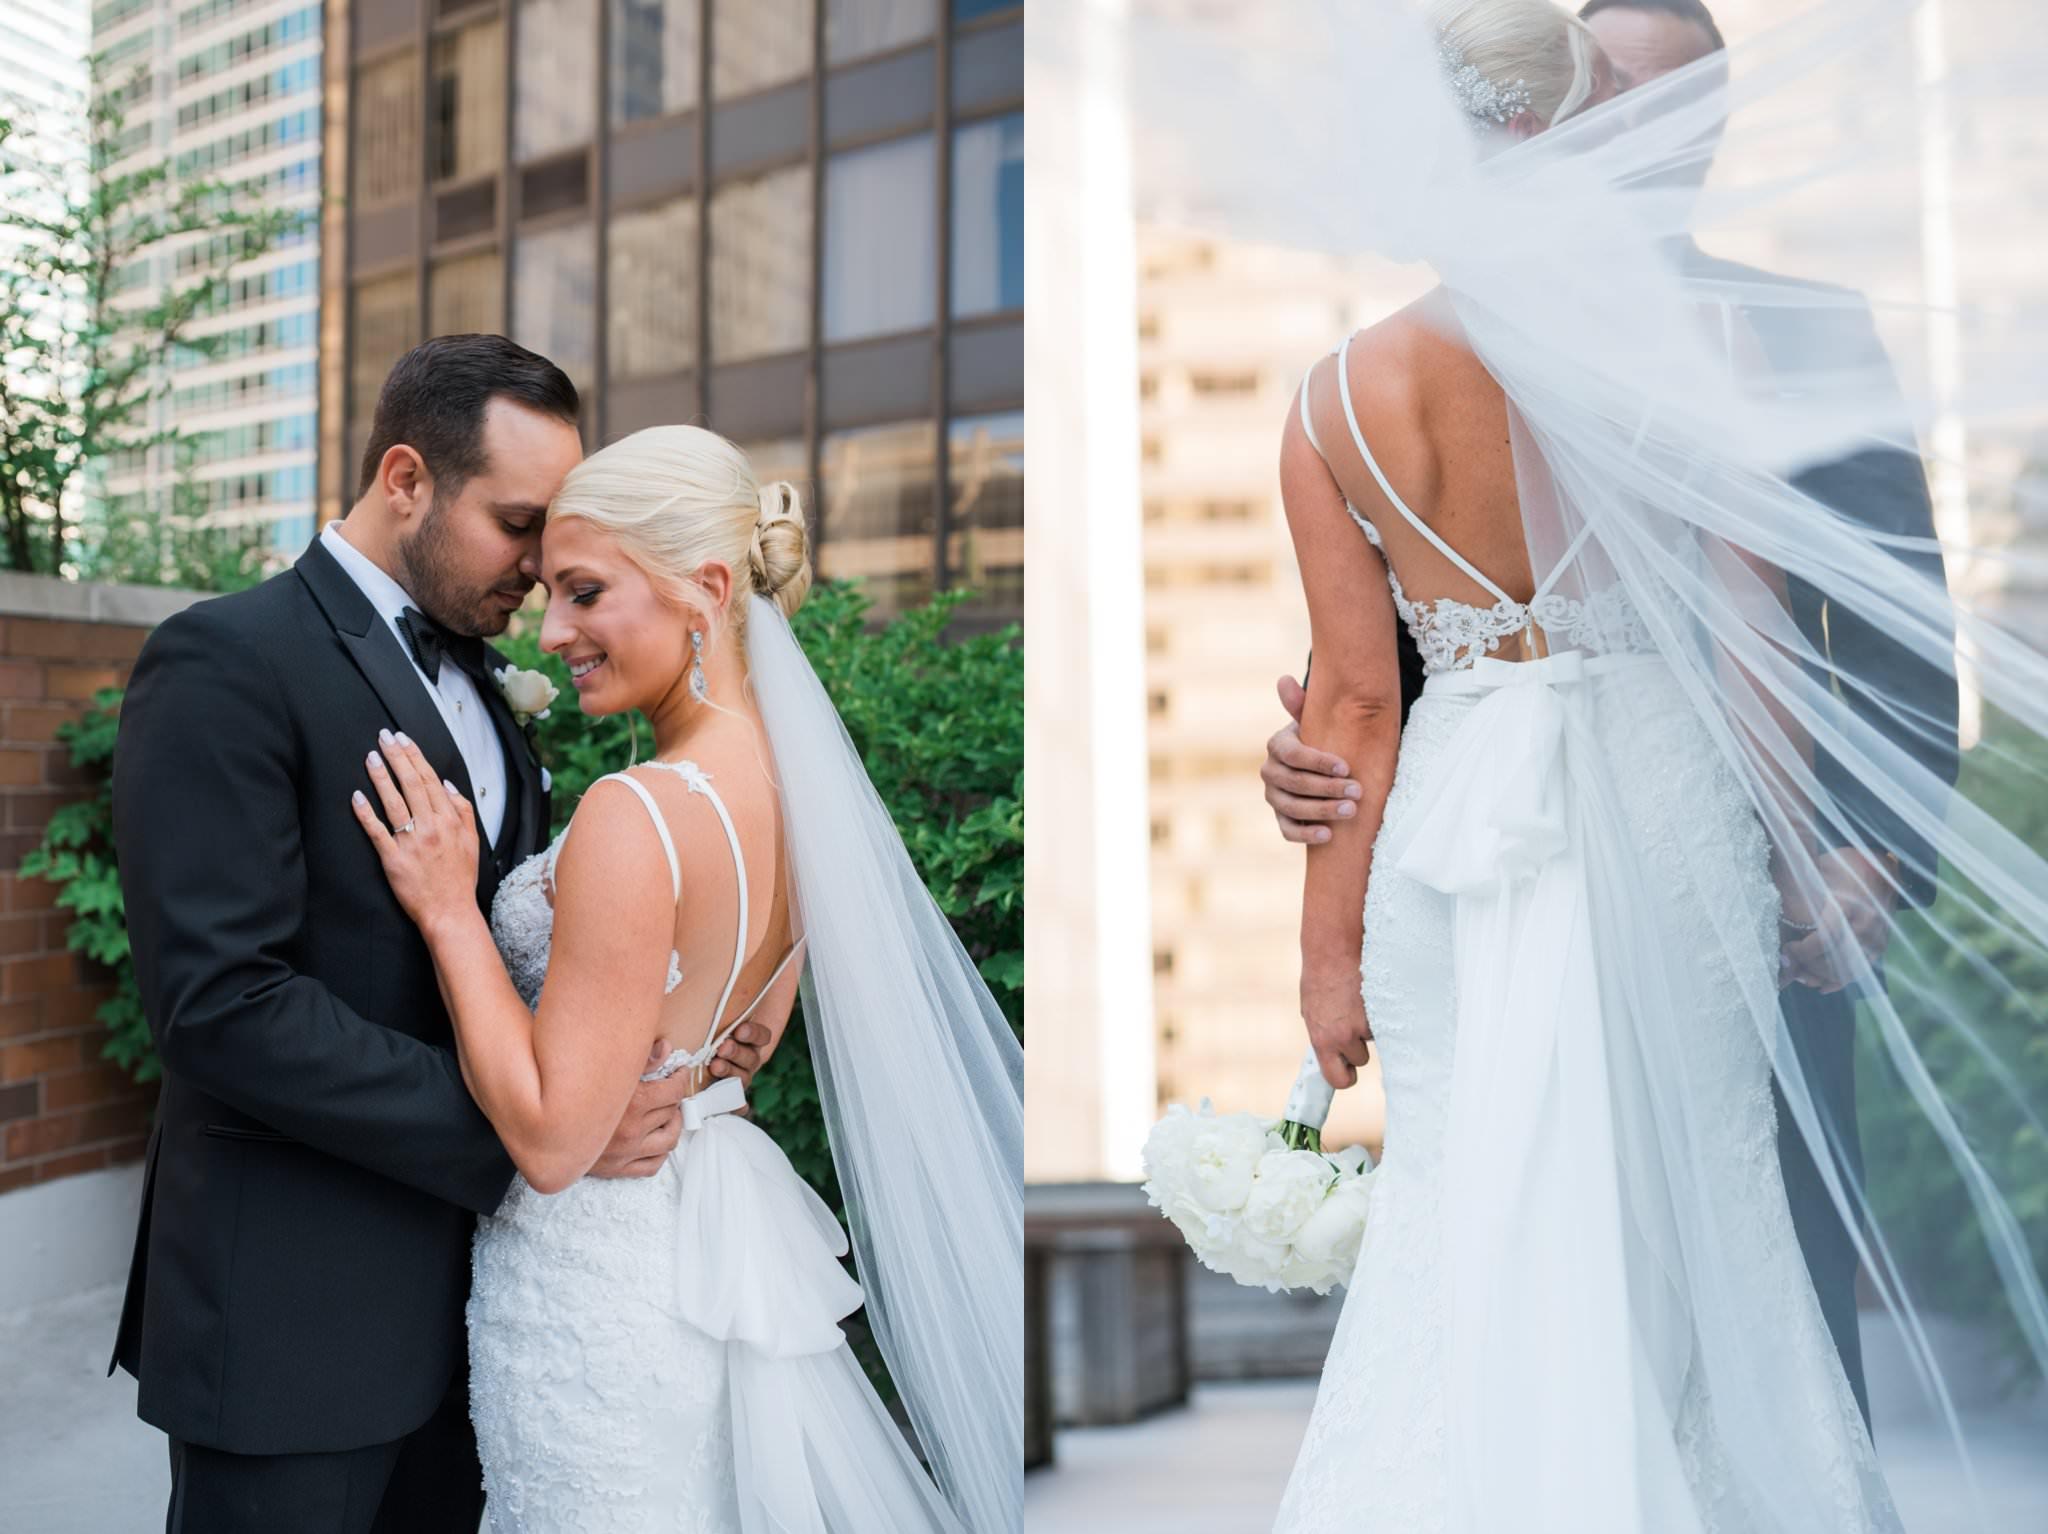 Adler-Planetarium-Chicago-Wedding-Photography-0025.JPG